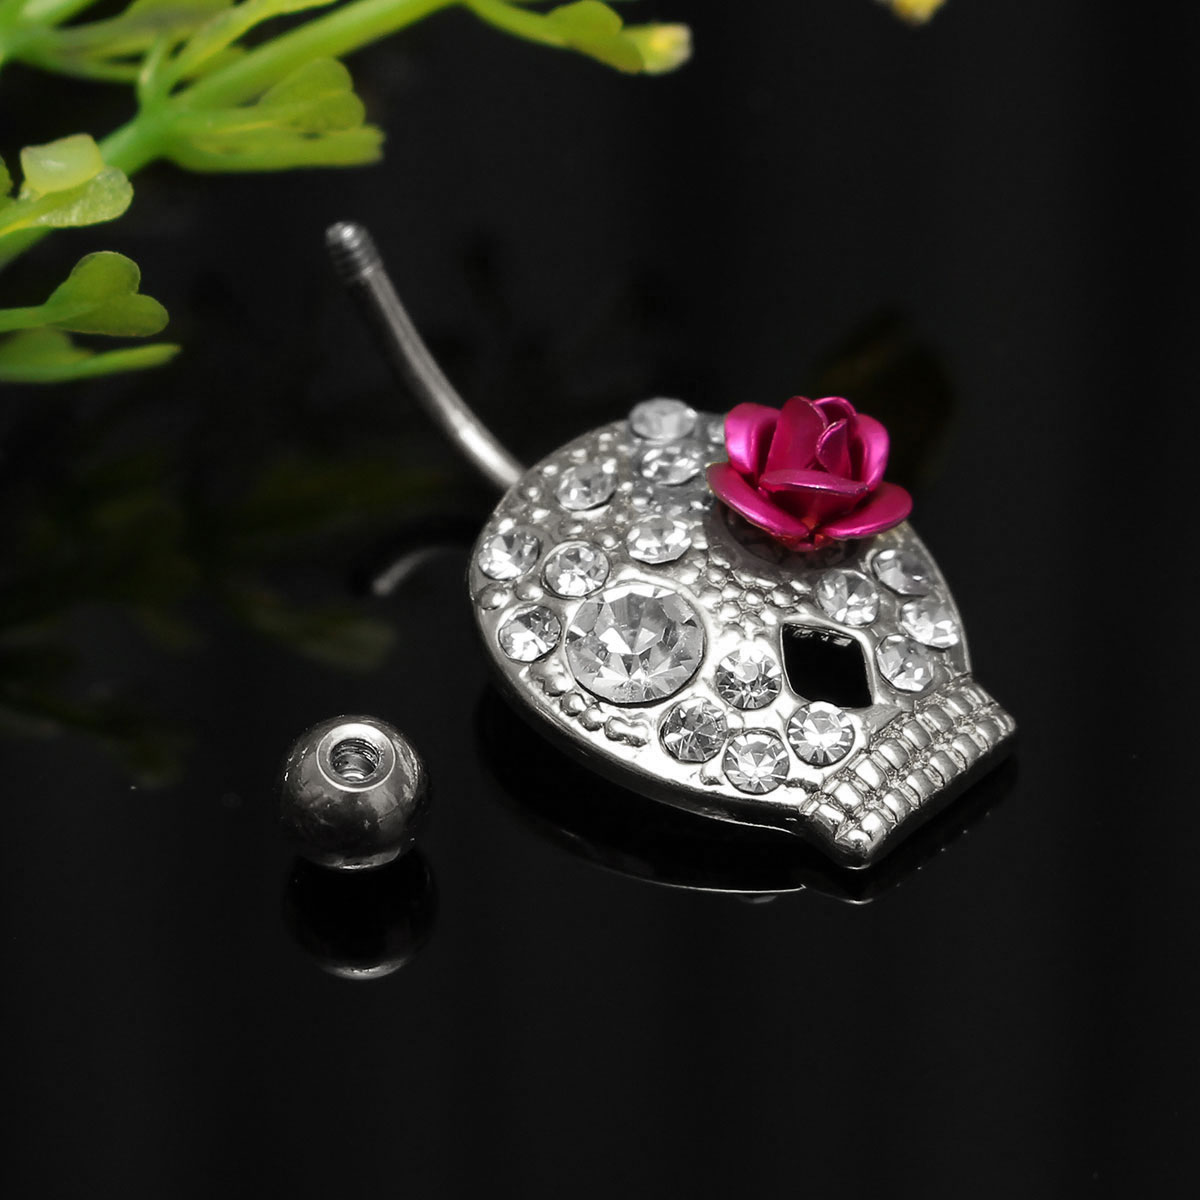 Flower Skull Navel Body Piercing Crystal Belly Bar Ring Women Jewelry